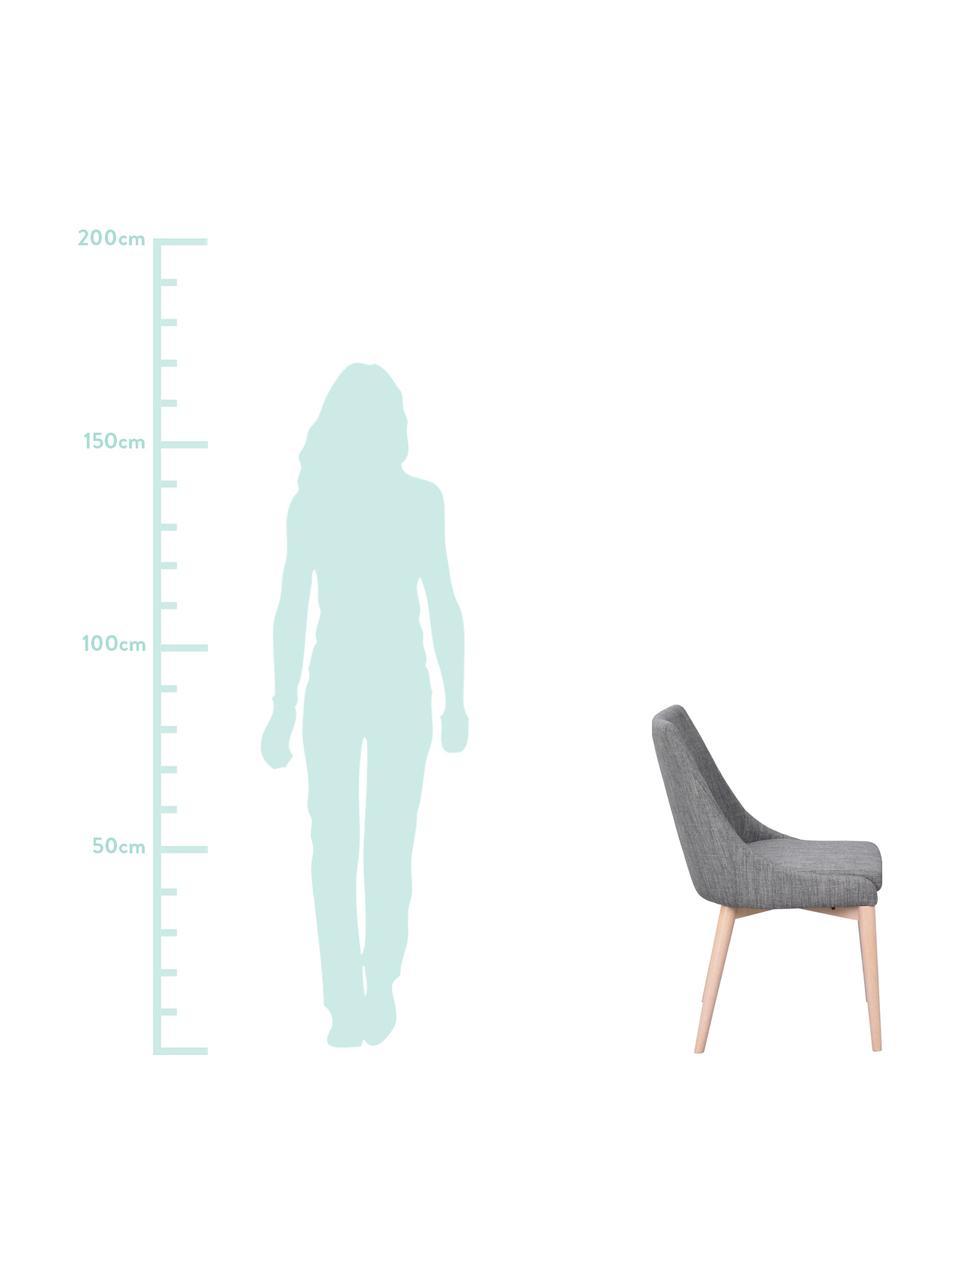 Gestoffeerde stoel Bea, Bekleding: 100% polyester, Frame: metaal, multiplex, Poten: eikenhout, massief, Donkergrijs, eikenhoutkleurig, 51 x 61 cm